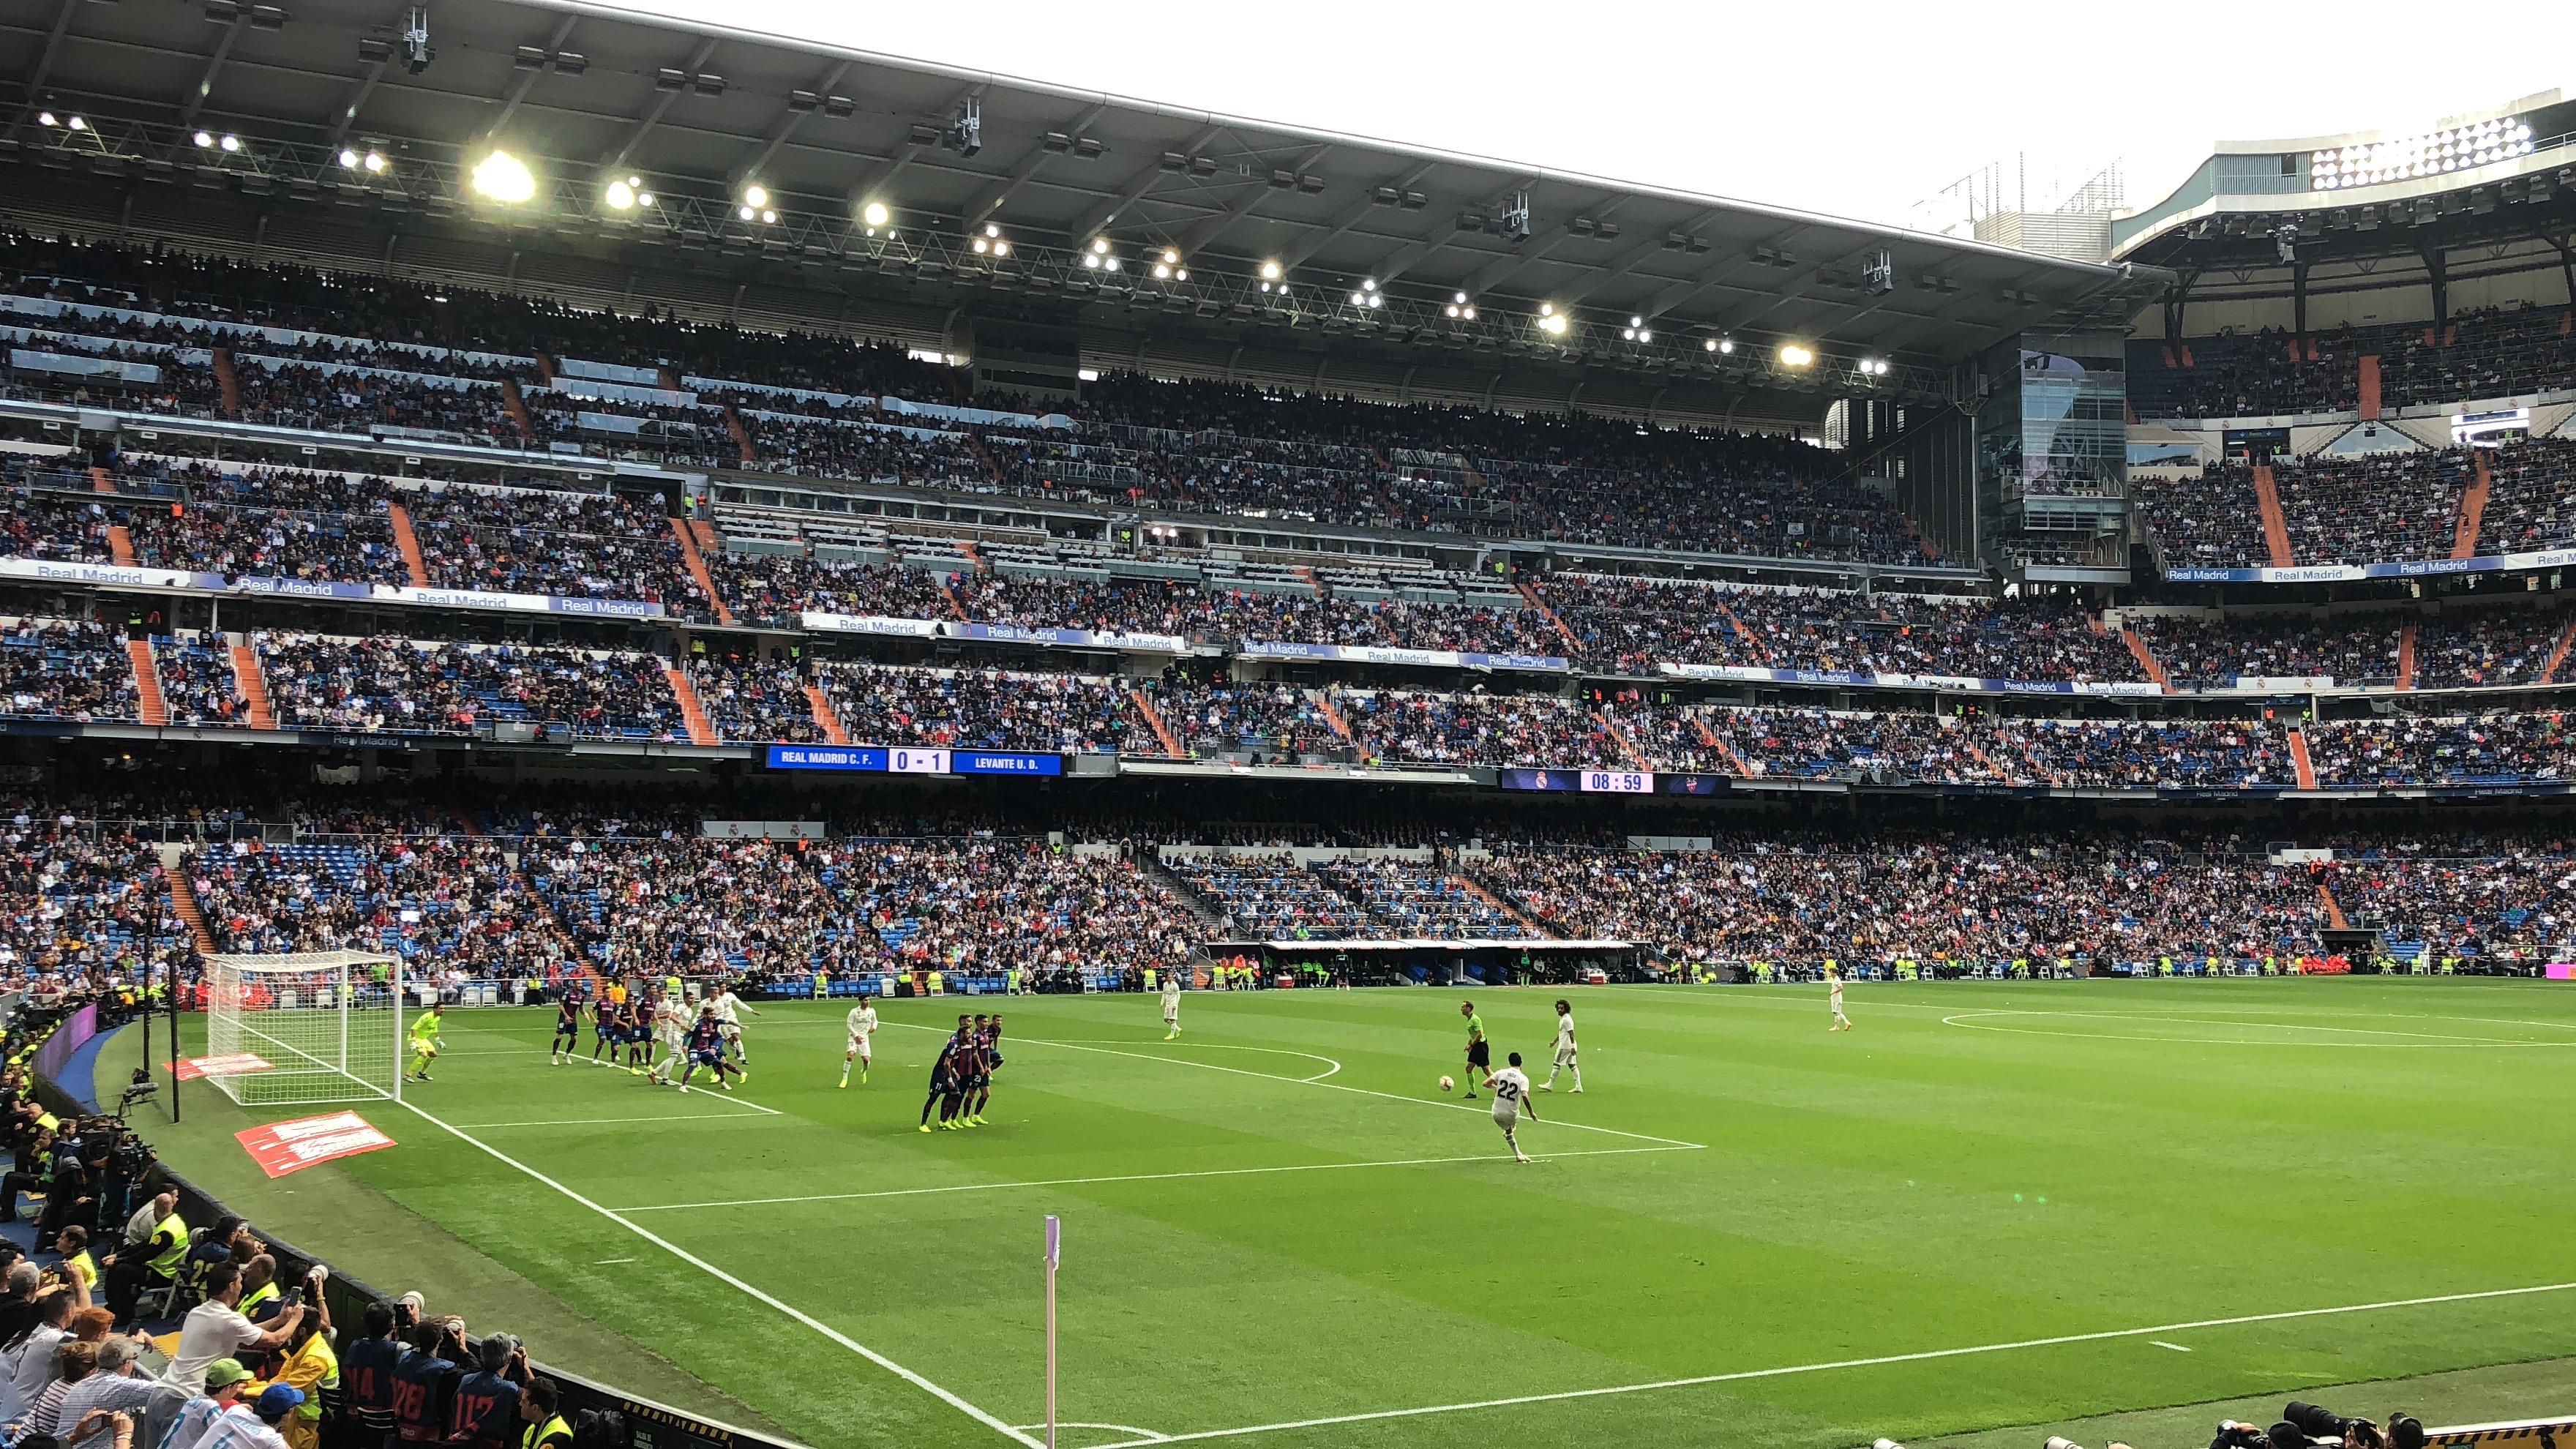 Proctor en Segovia students attend a Real Madrid match.